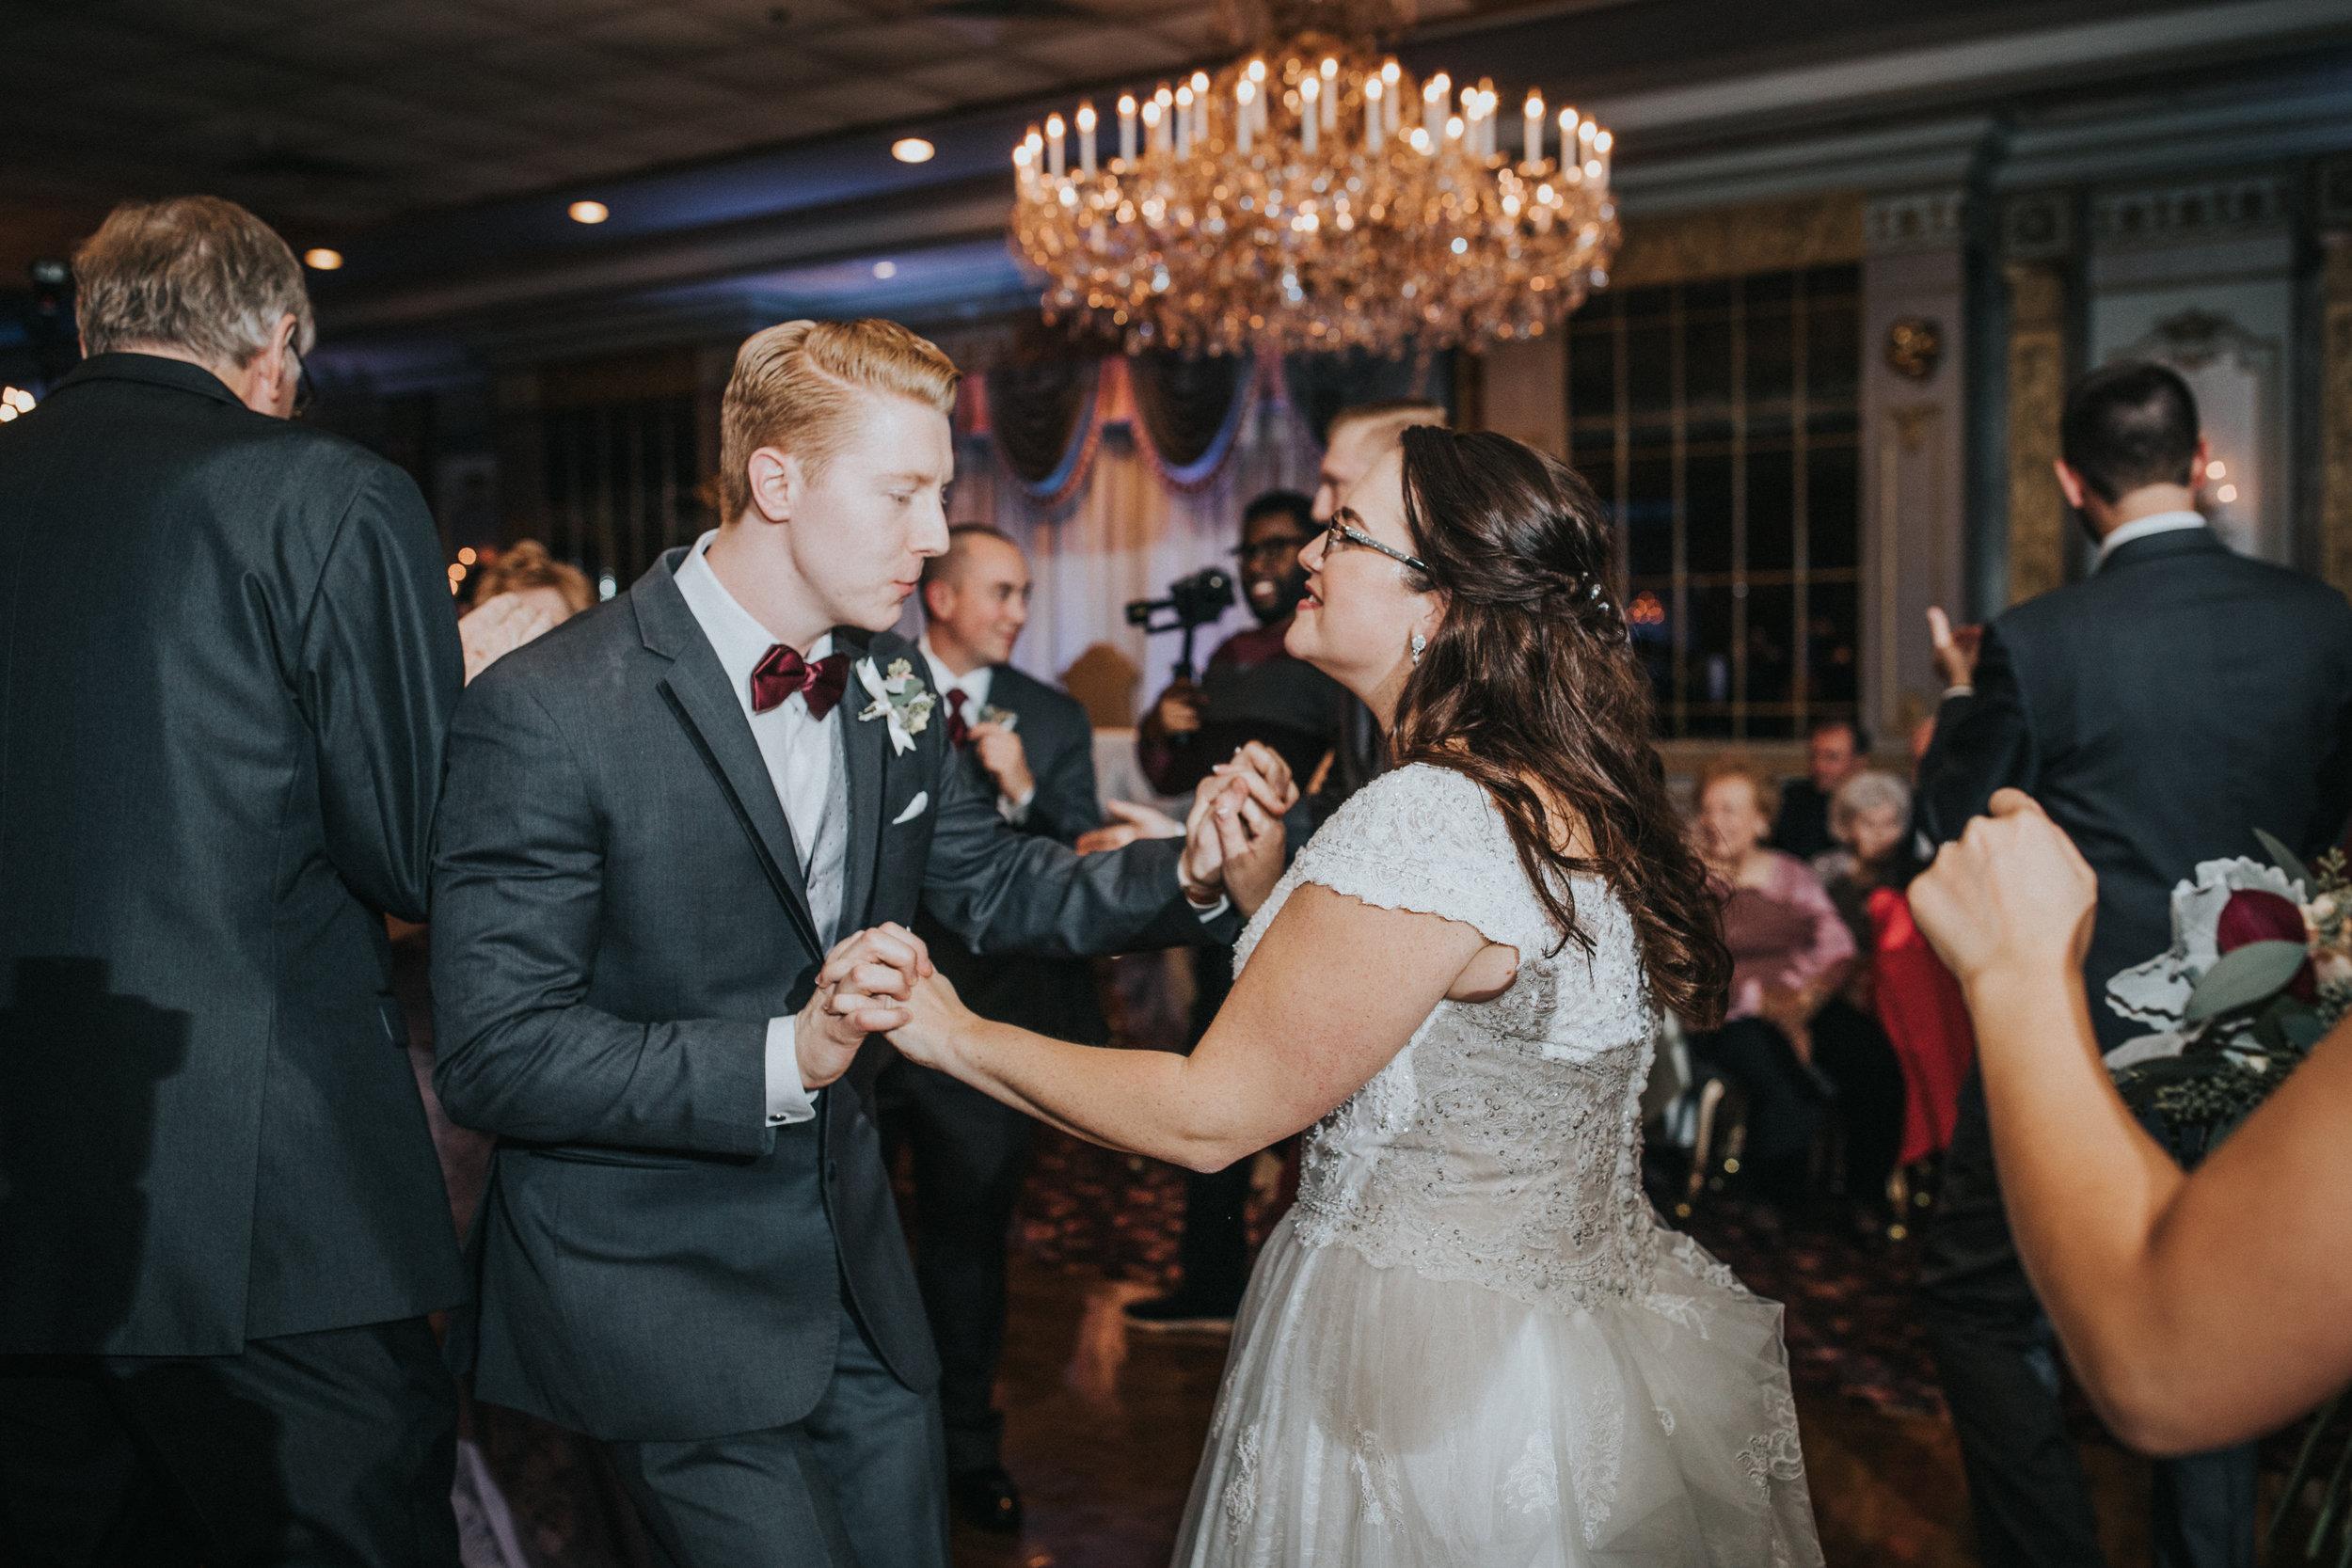 New-Jersey-Wedding-Photography-Fishers-Tudor-House-JennaLynnPhotography-Reception-Kathleen&Eddie-47.jpg